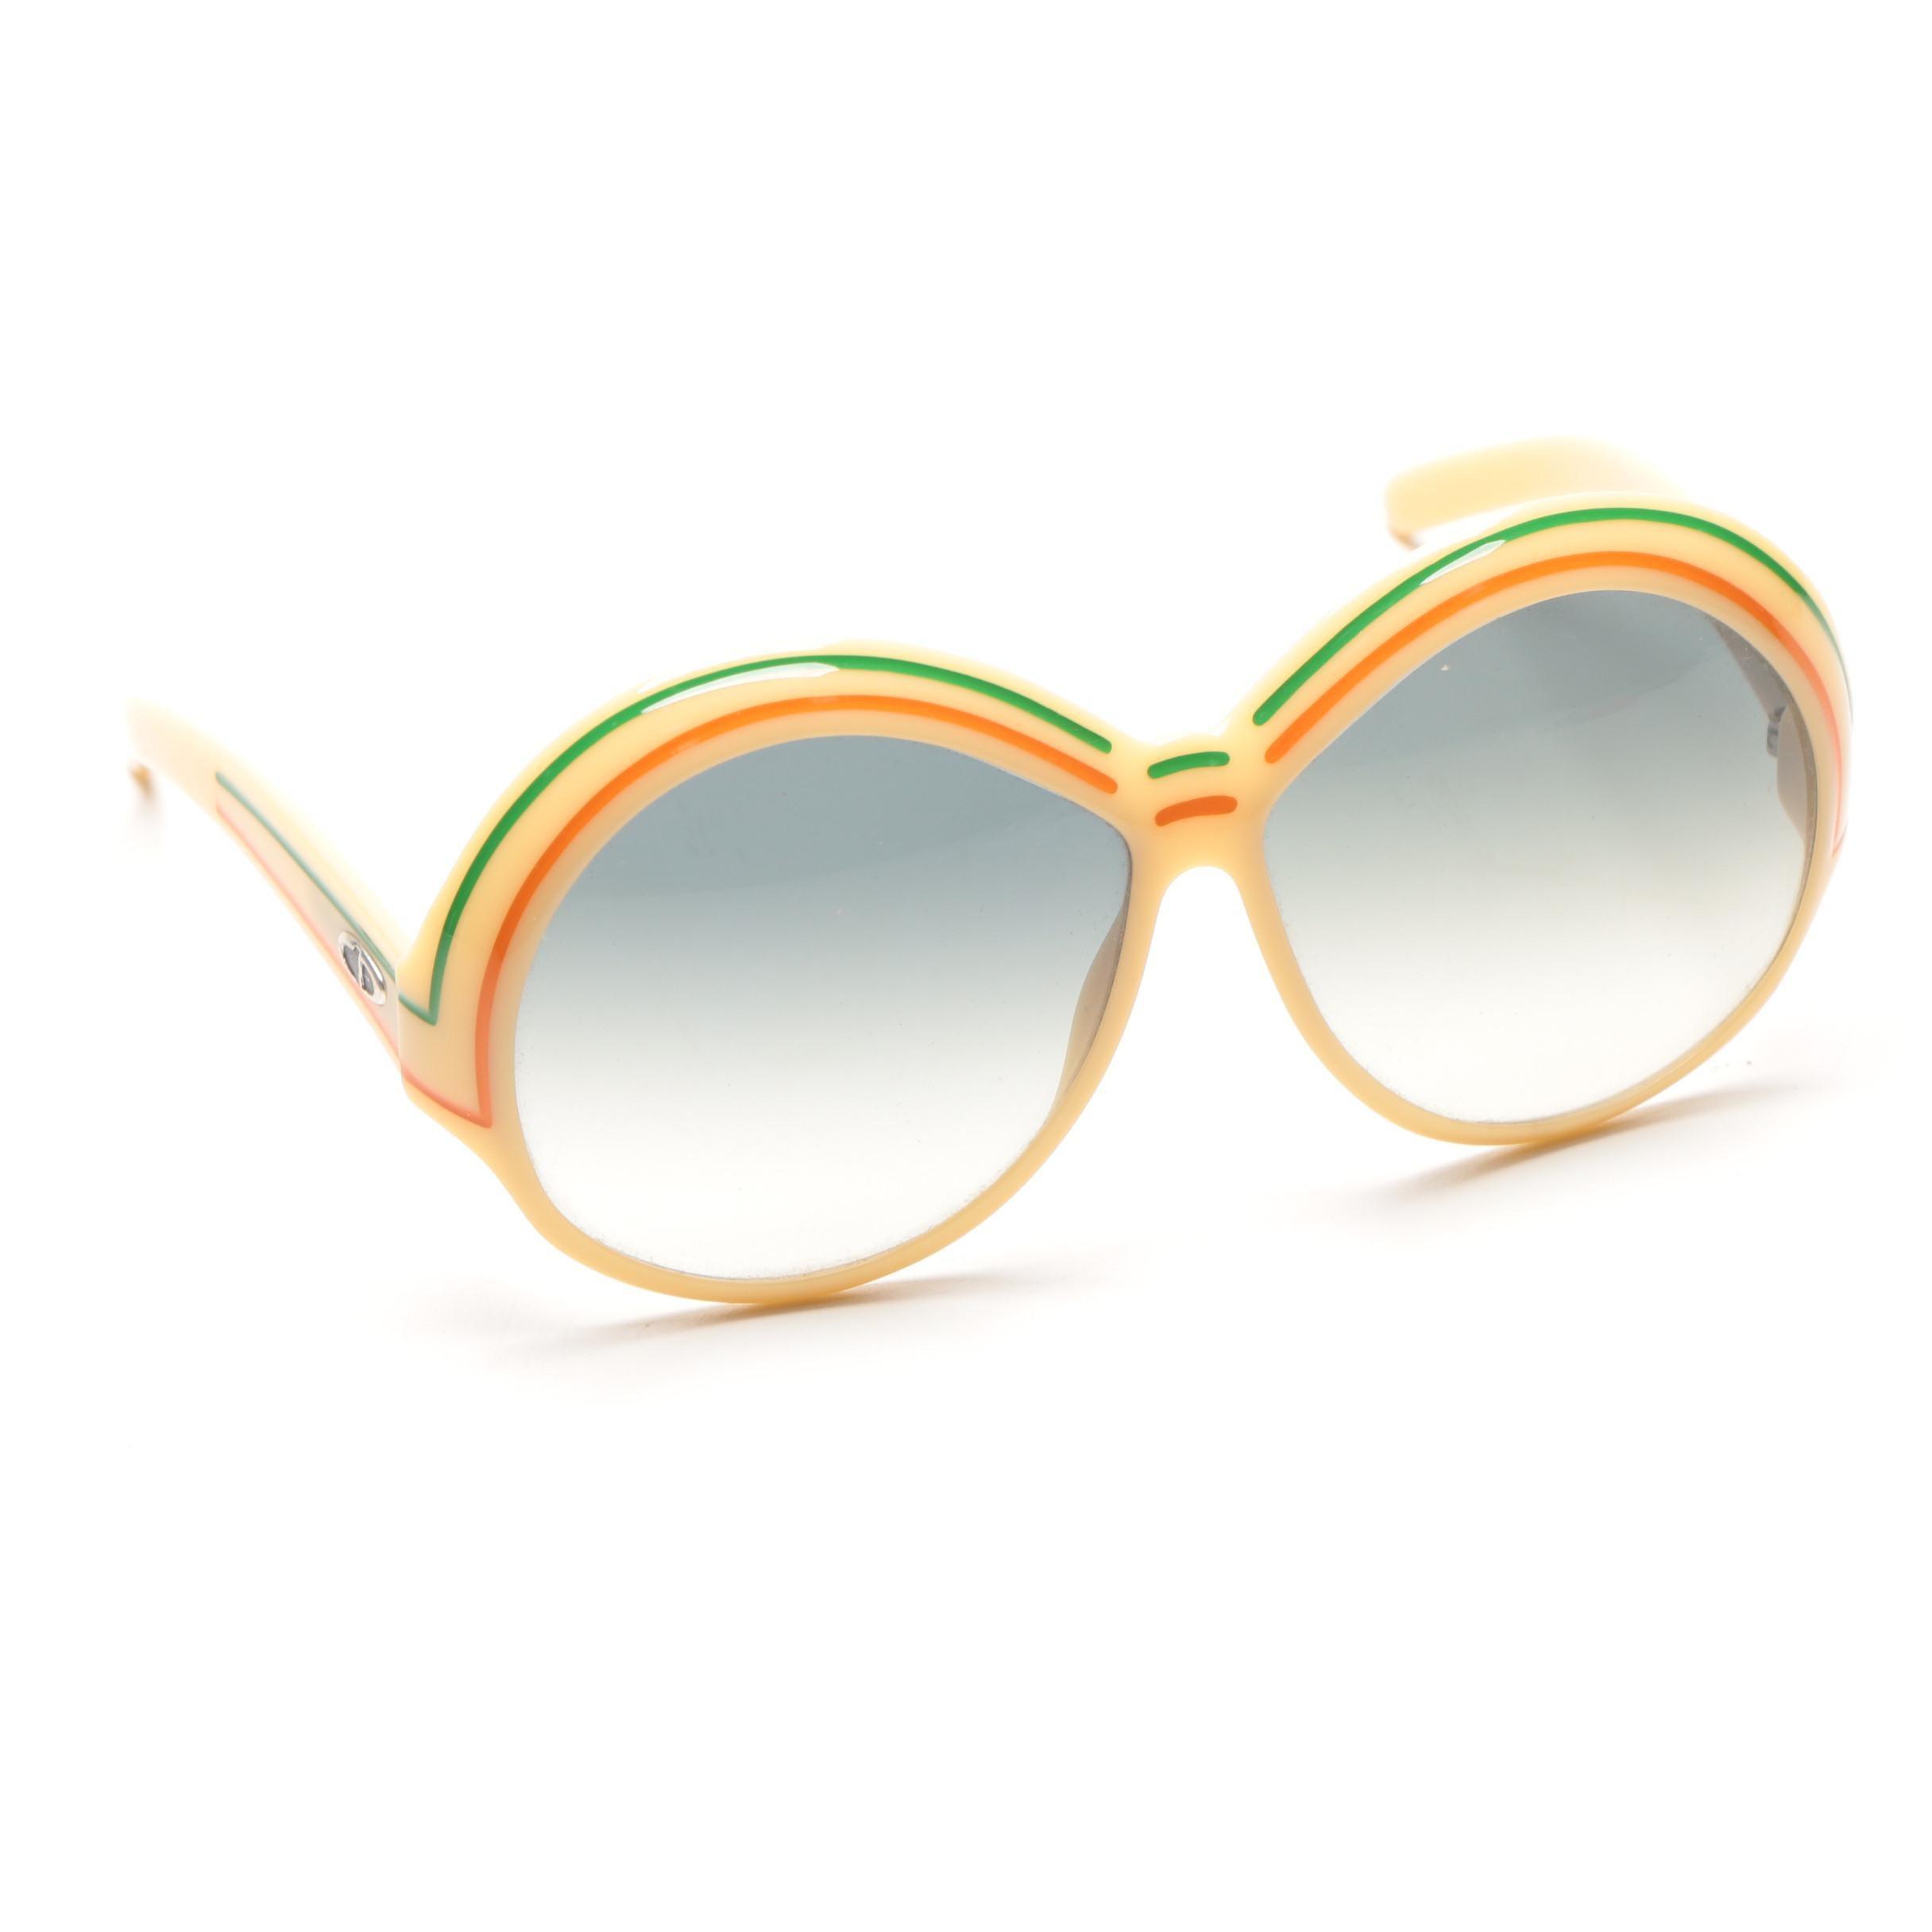 Circa 1970s Christian Dior Oversized Sunglasses